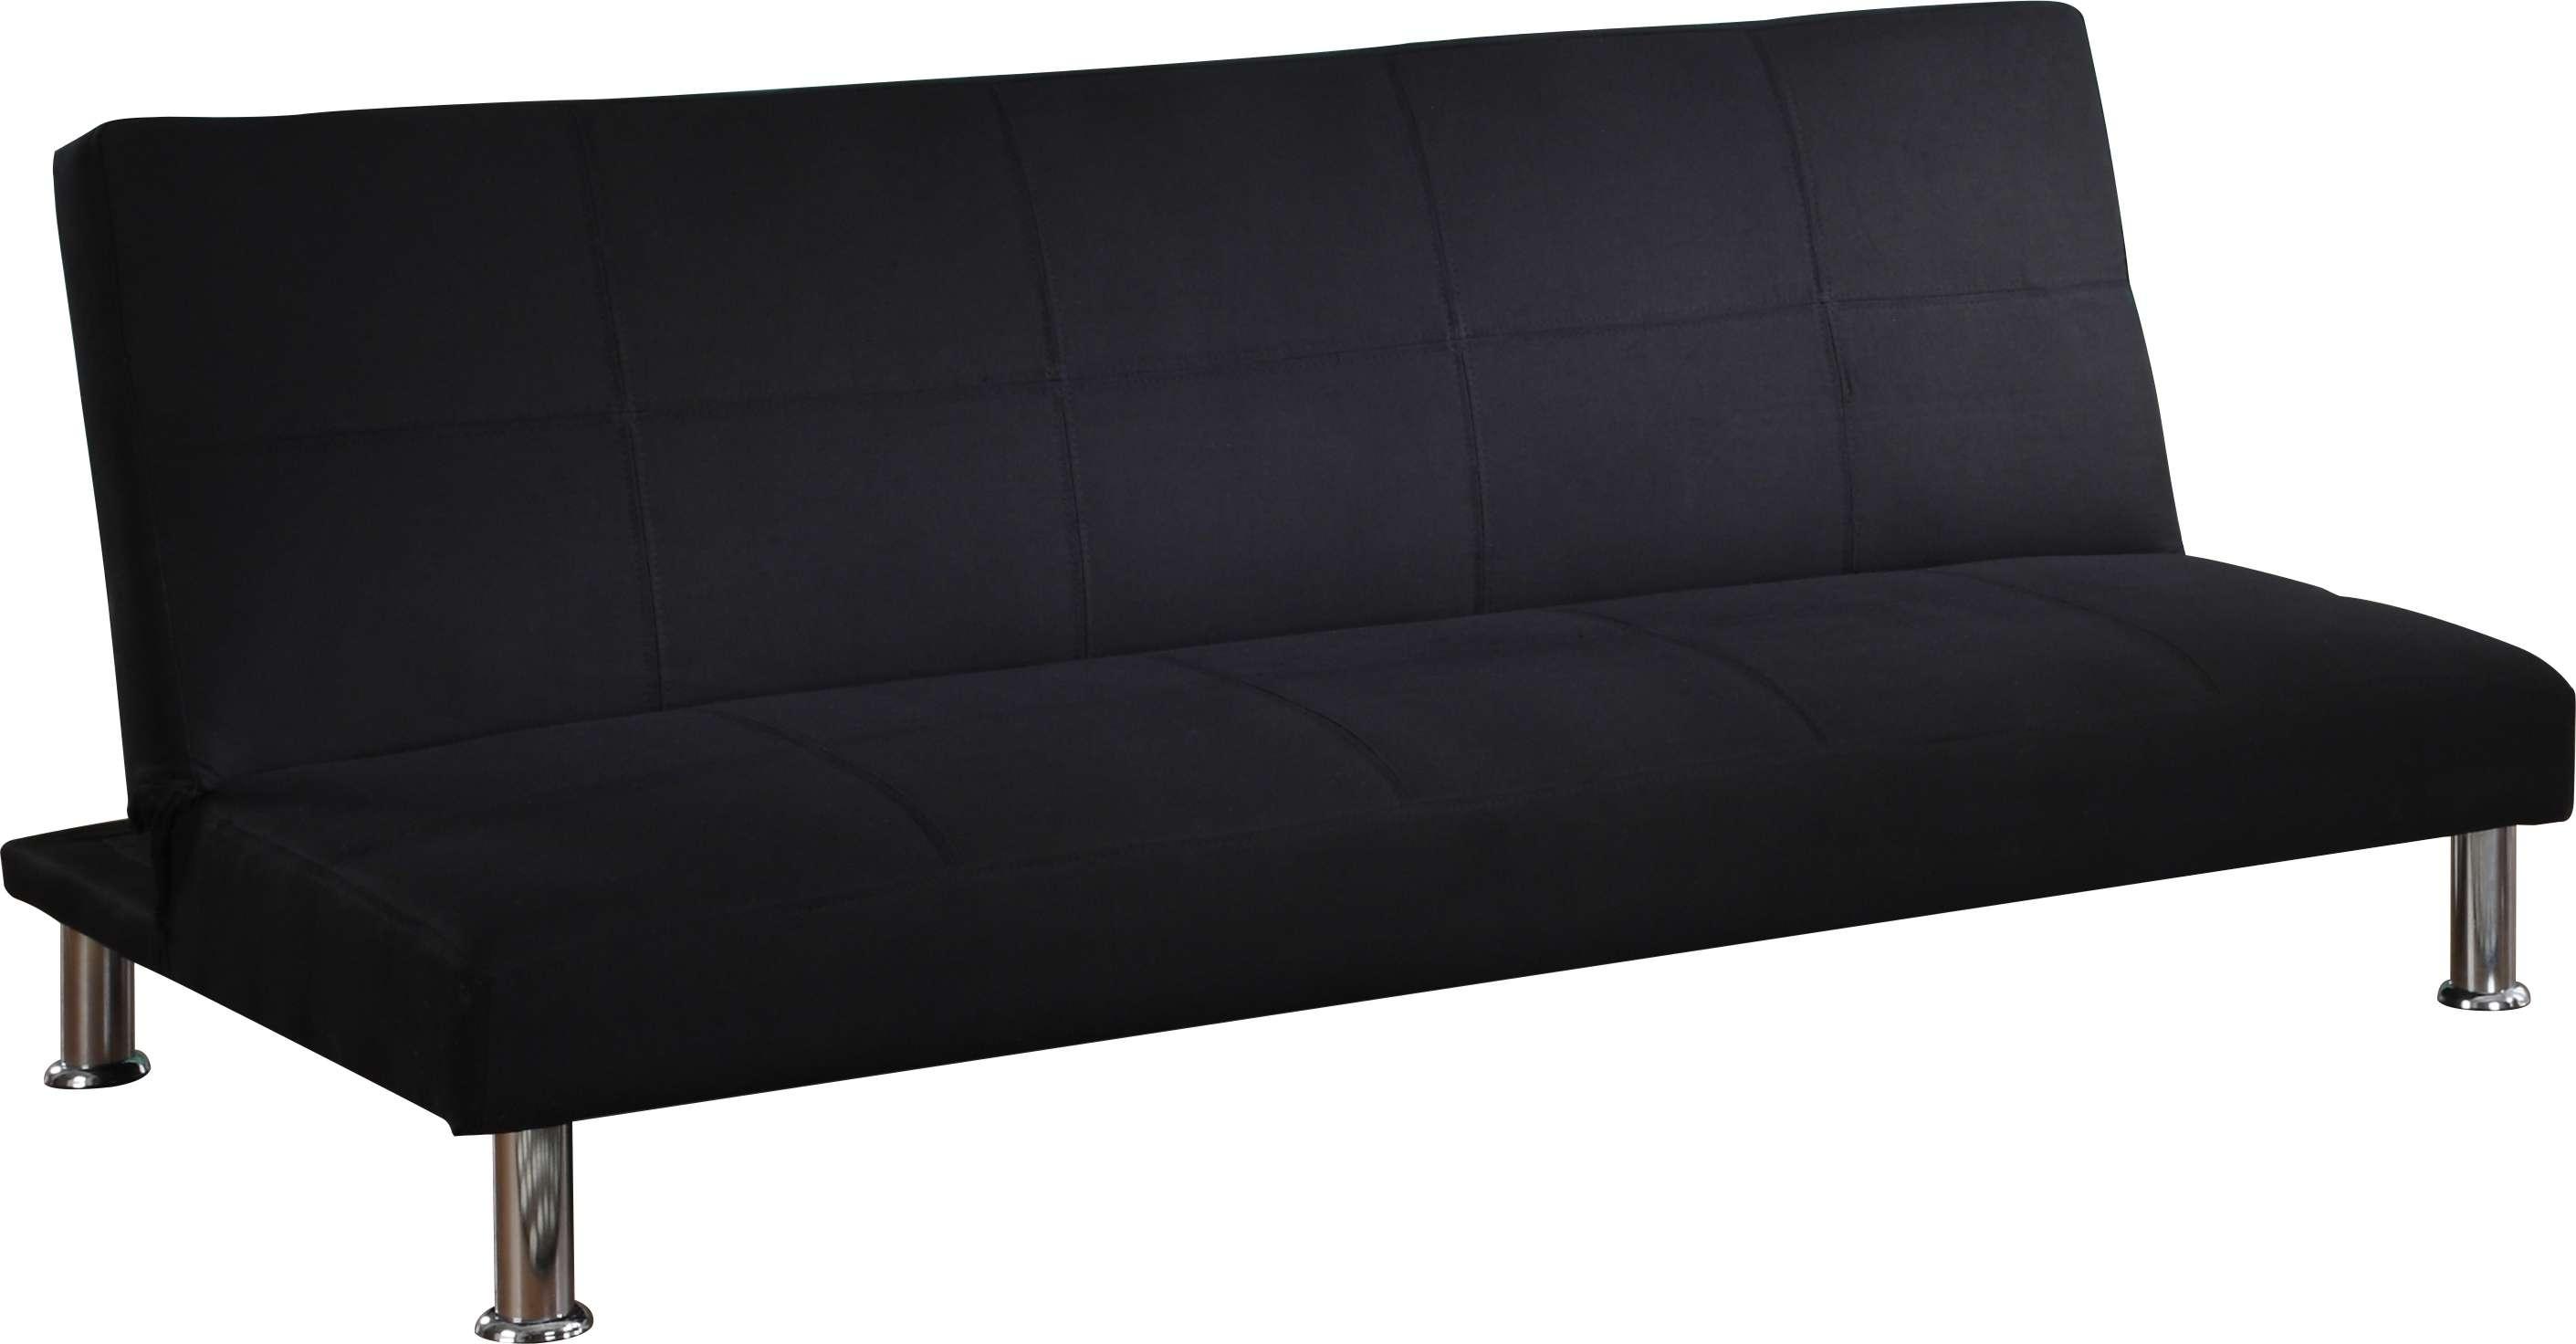 Pilaster Designs Fabric Klik Klak Sofa Bed Sleeper